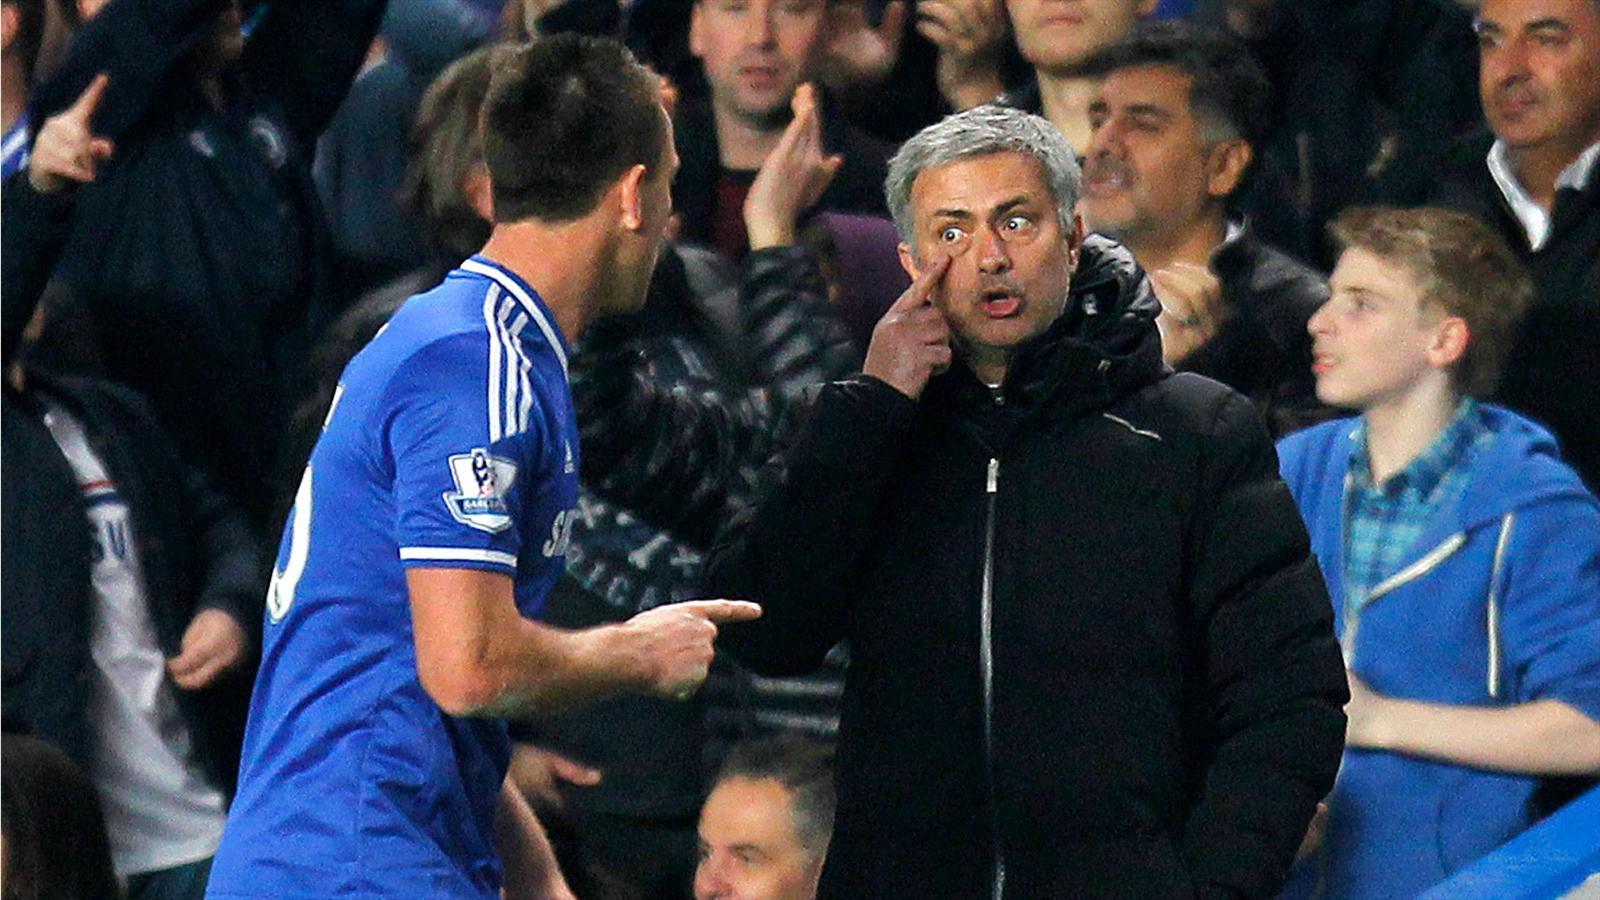 José Mourinho and John Terry (Chelsea), 2013-2014